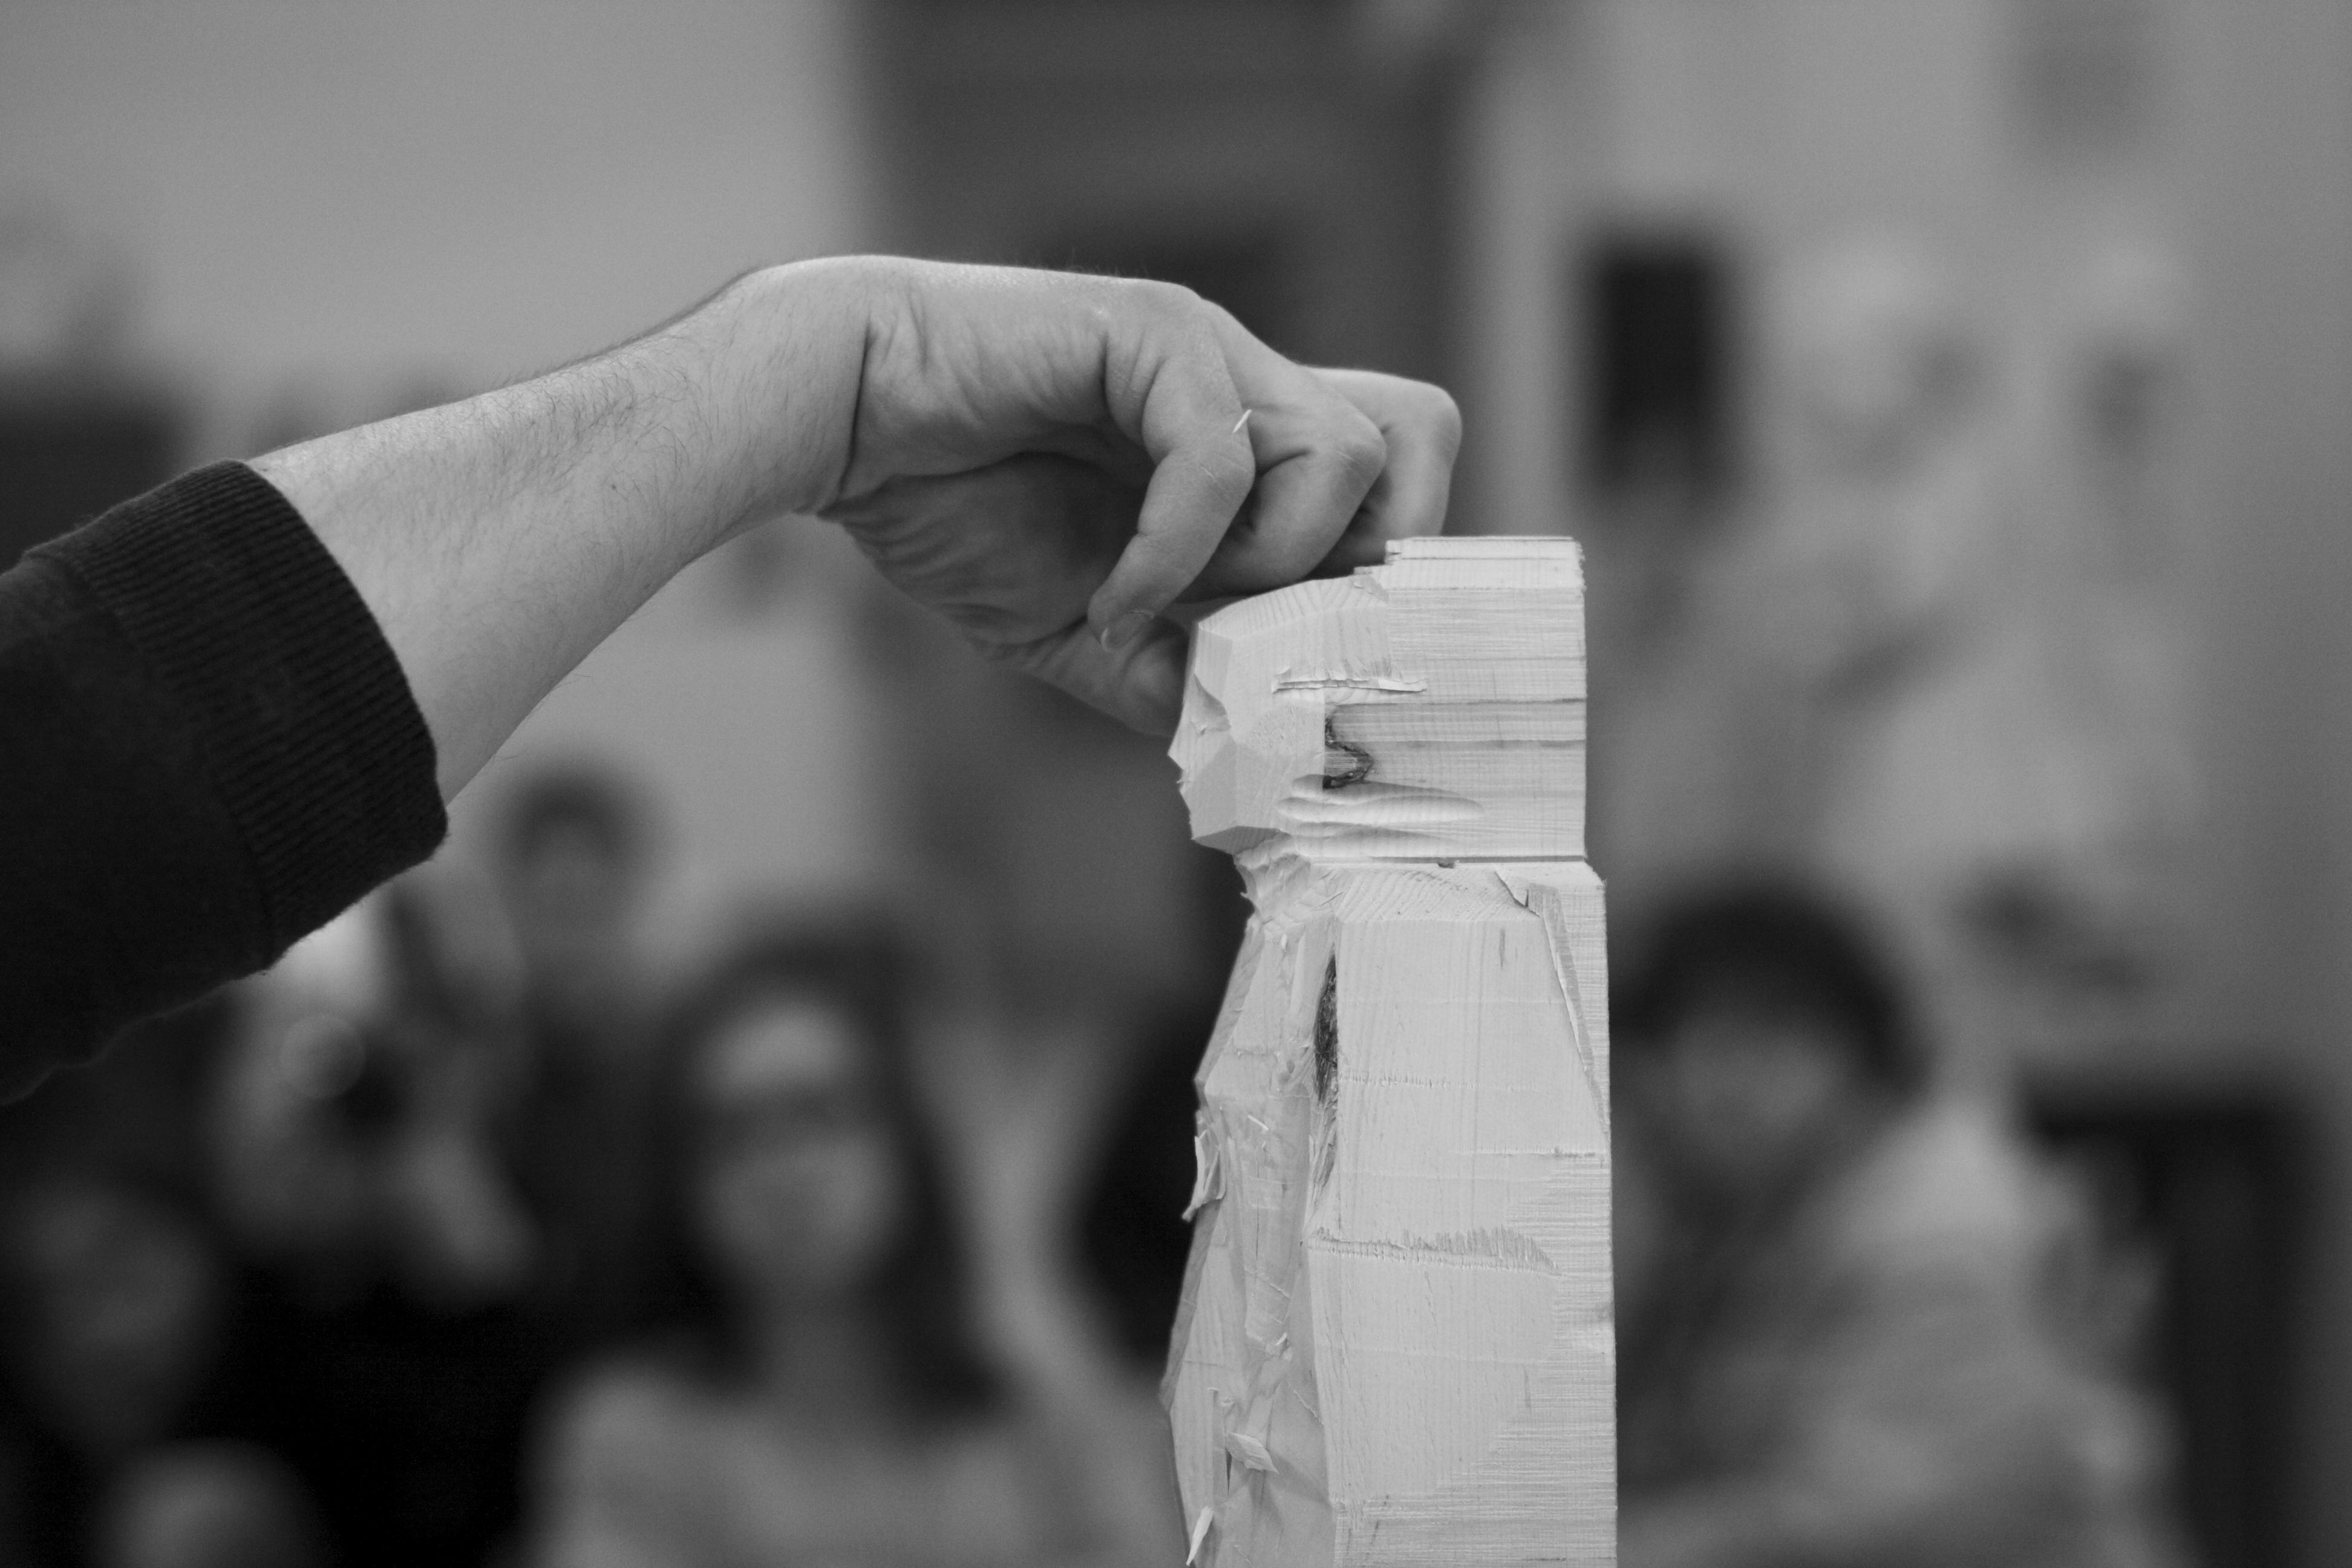 Flickr - Aron Demetz - Dialoghi e materia - Workshop a cura di Franco Reina76